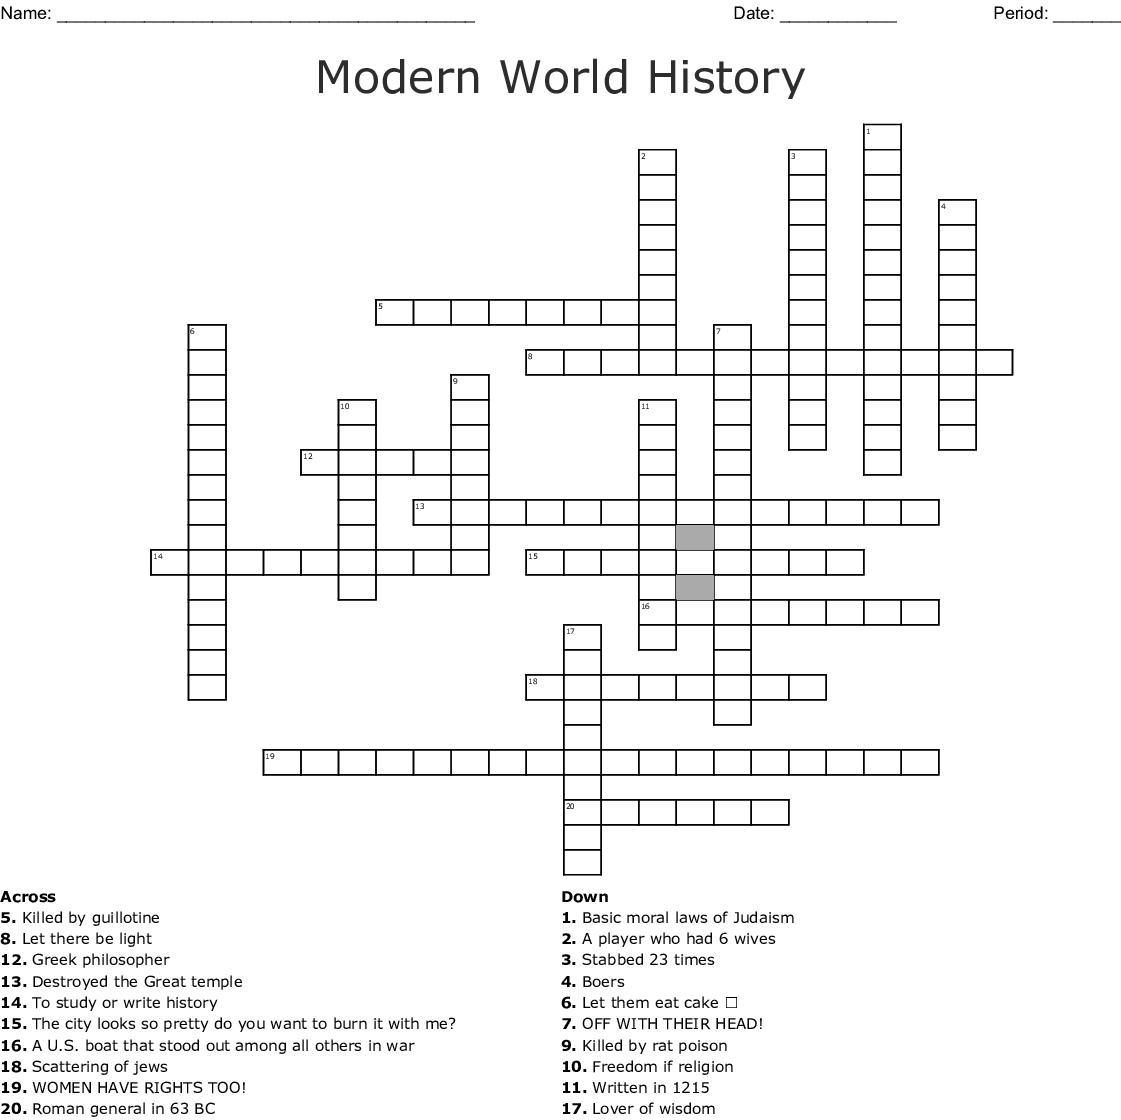 Modern World History Crossword